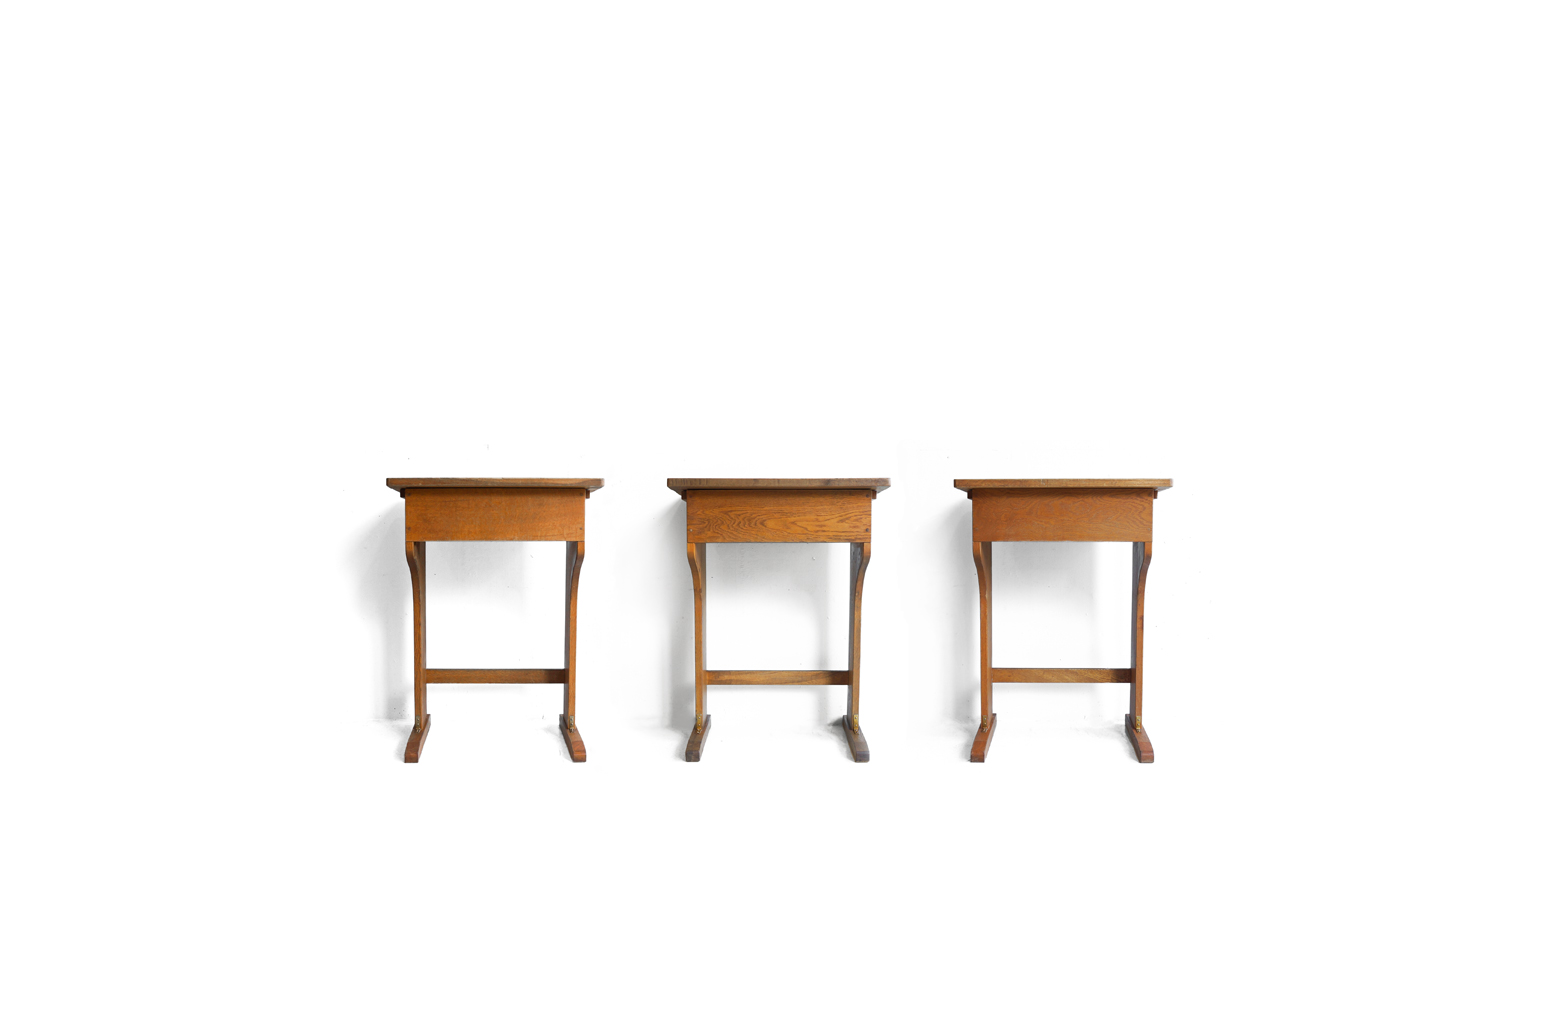 Vintage Wooden School Desk/ヴィンテージ スクールデスク 学校机 レトロ テーブル